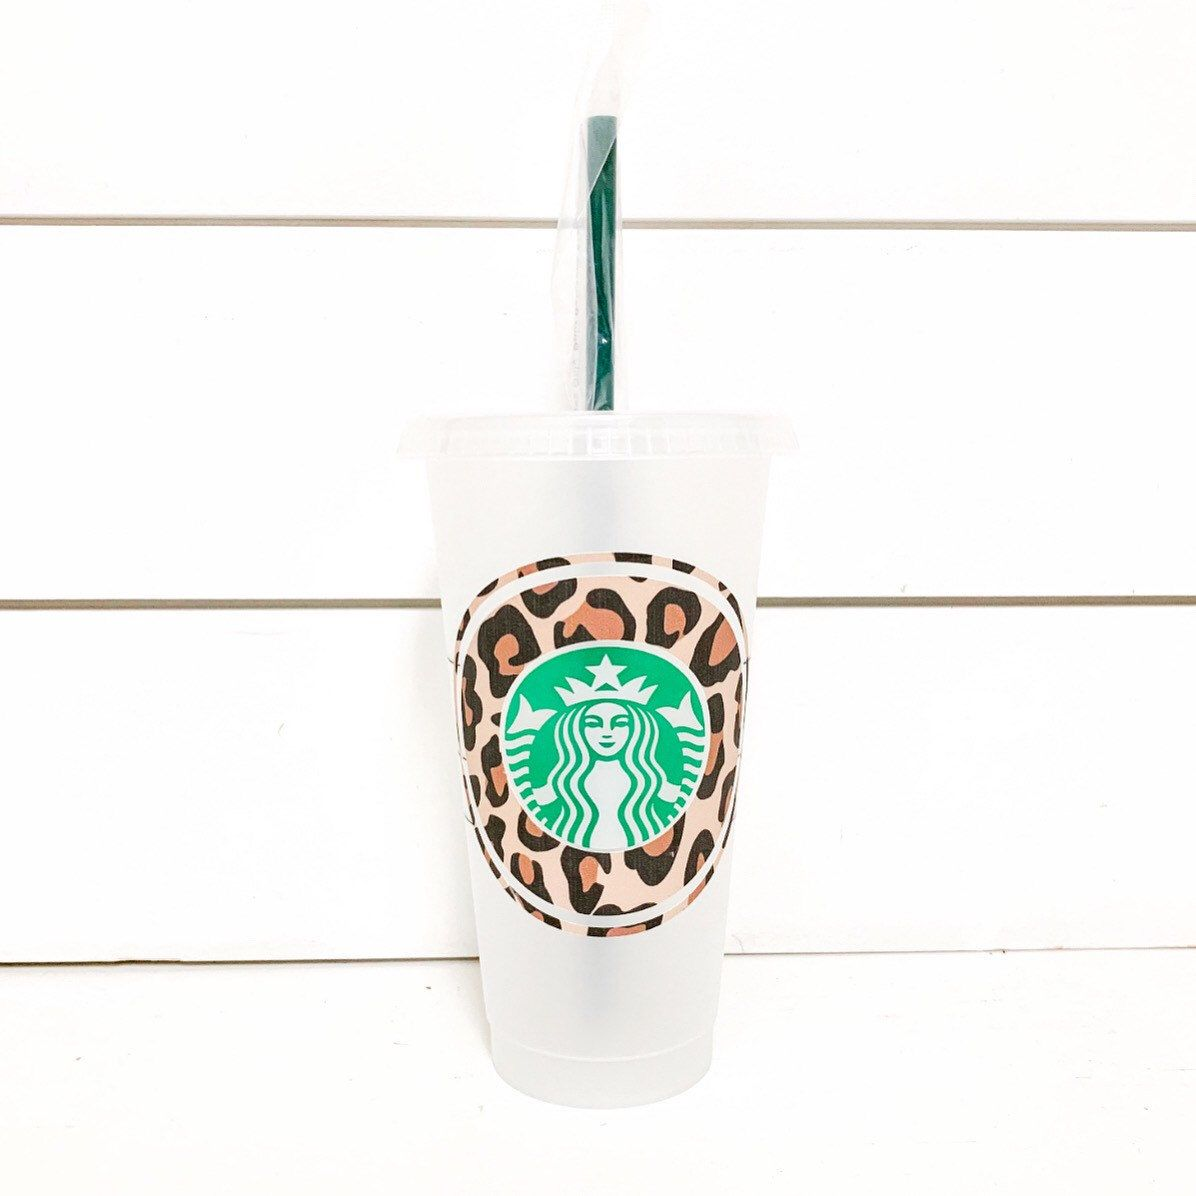 Leopard Print Starbucks Cup Reusable Starbucks Cup Starbucks Cup With Straw Starbucks Cups Custom Starbucks Cup Tumbler Cups Diy